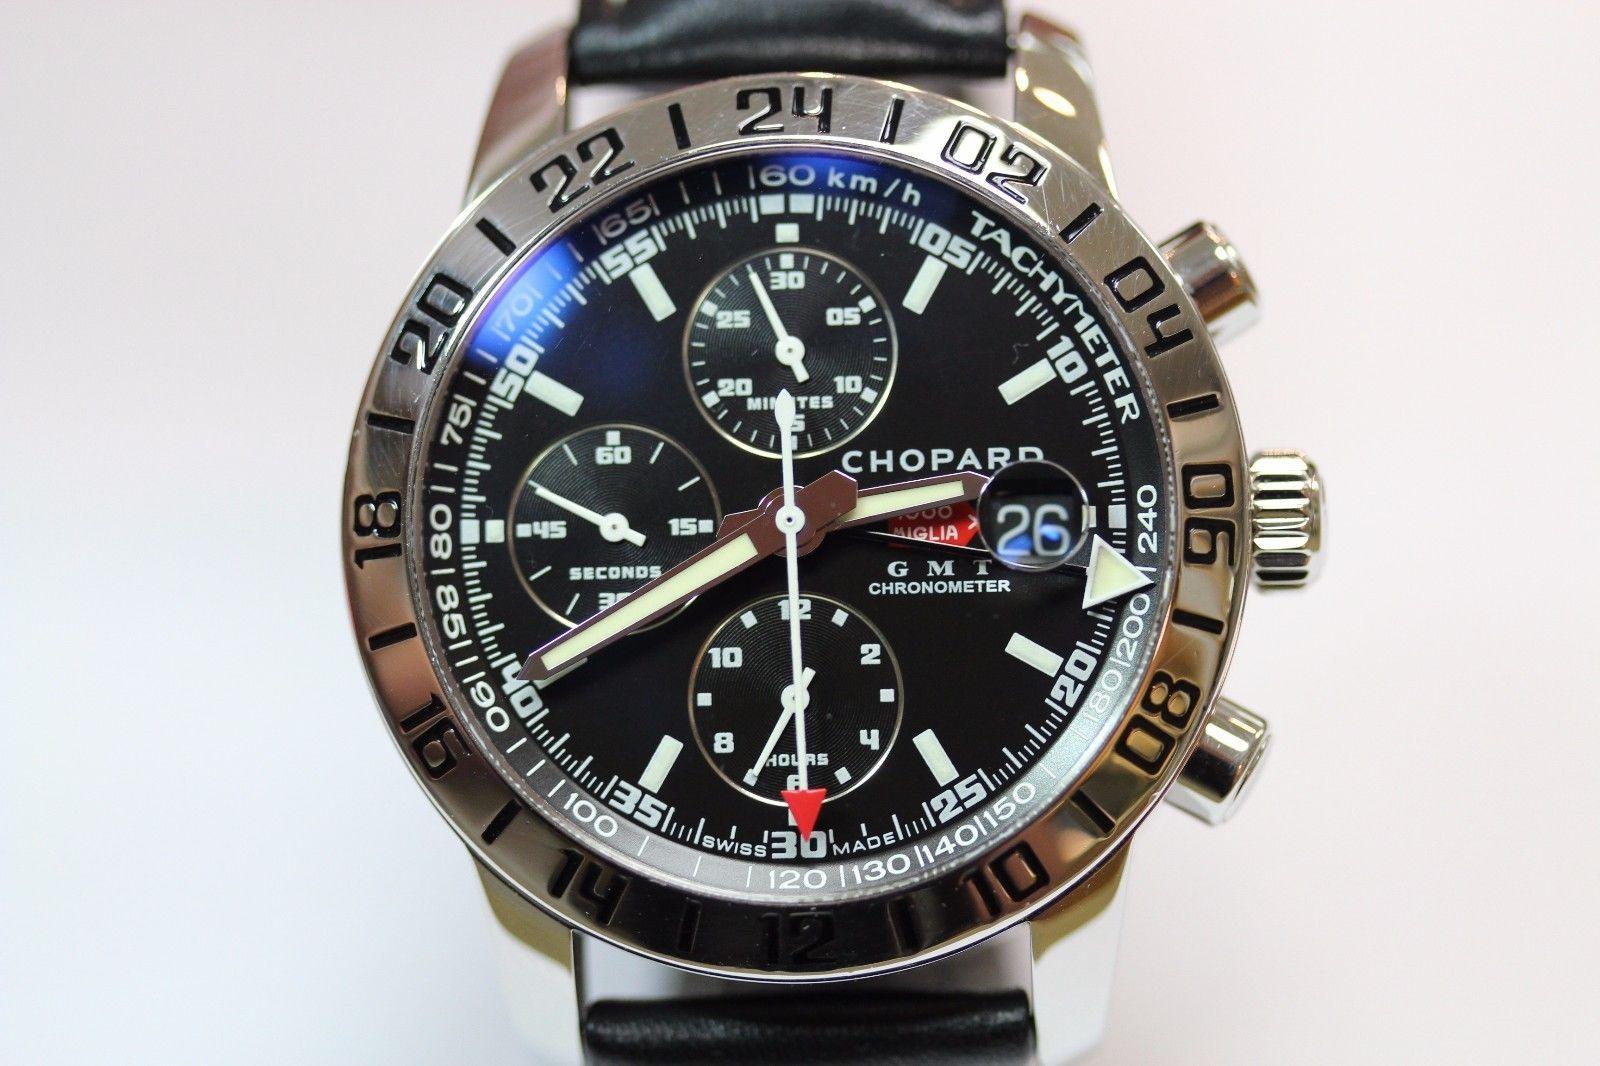 23e220223d7f0 Chopard Mille Miglia GMT Chronograph ref. 168992-3001 8992 Black Dial